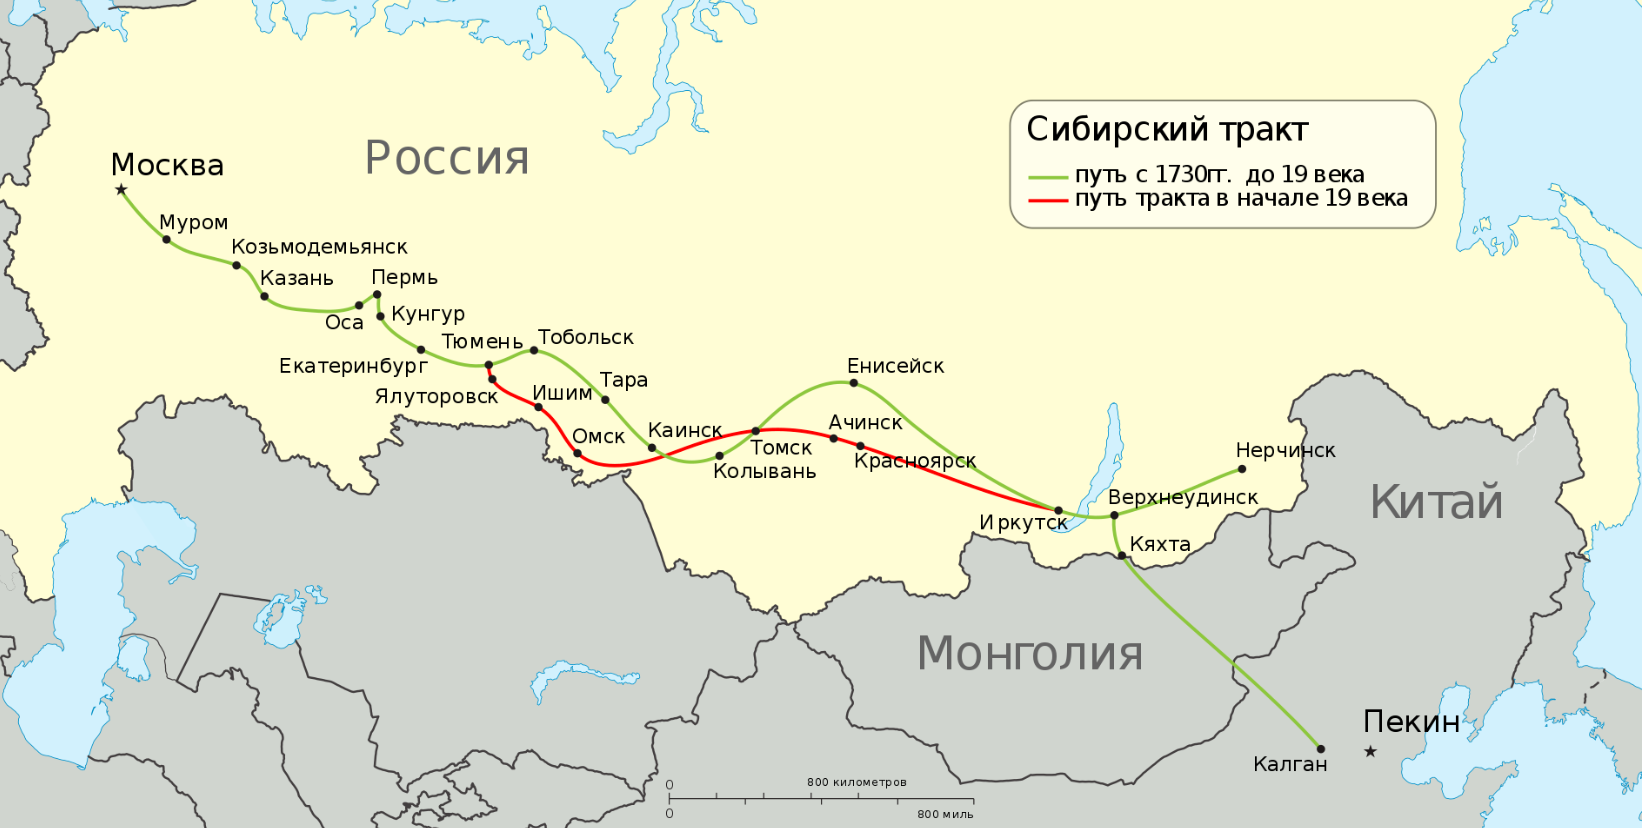 Siberia the map